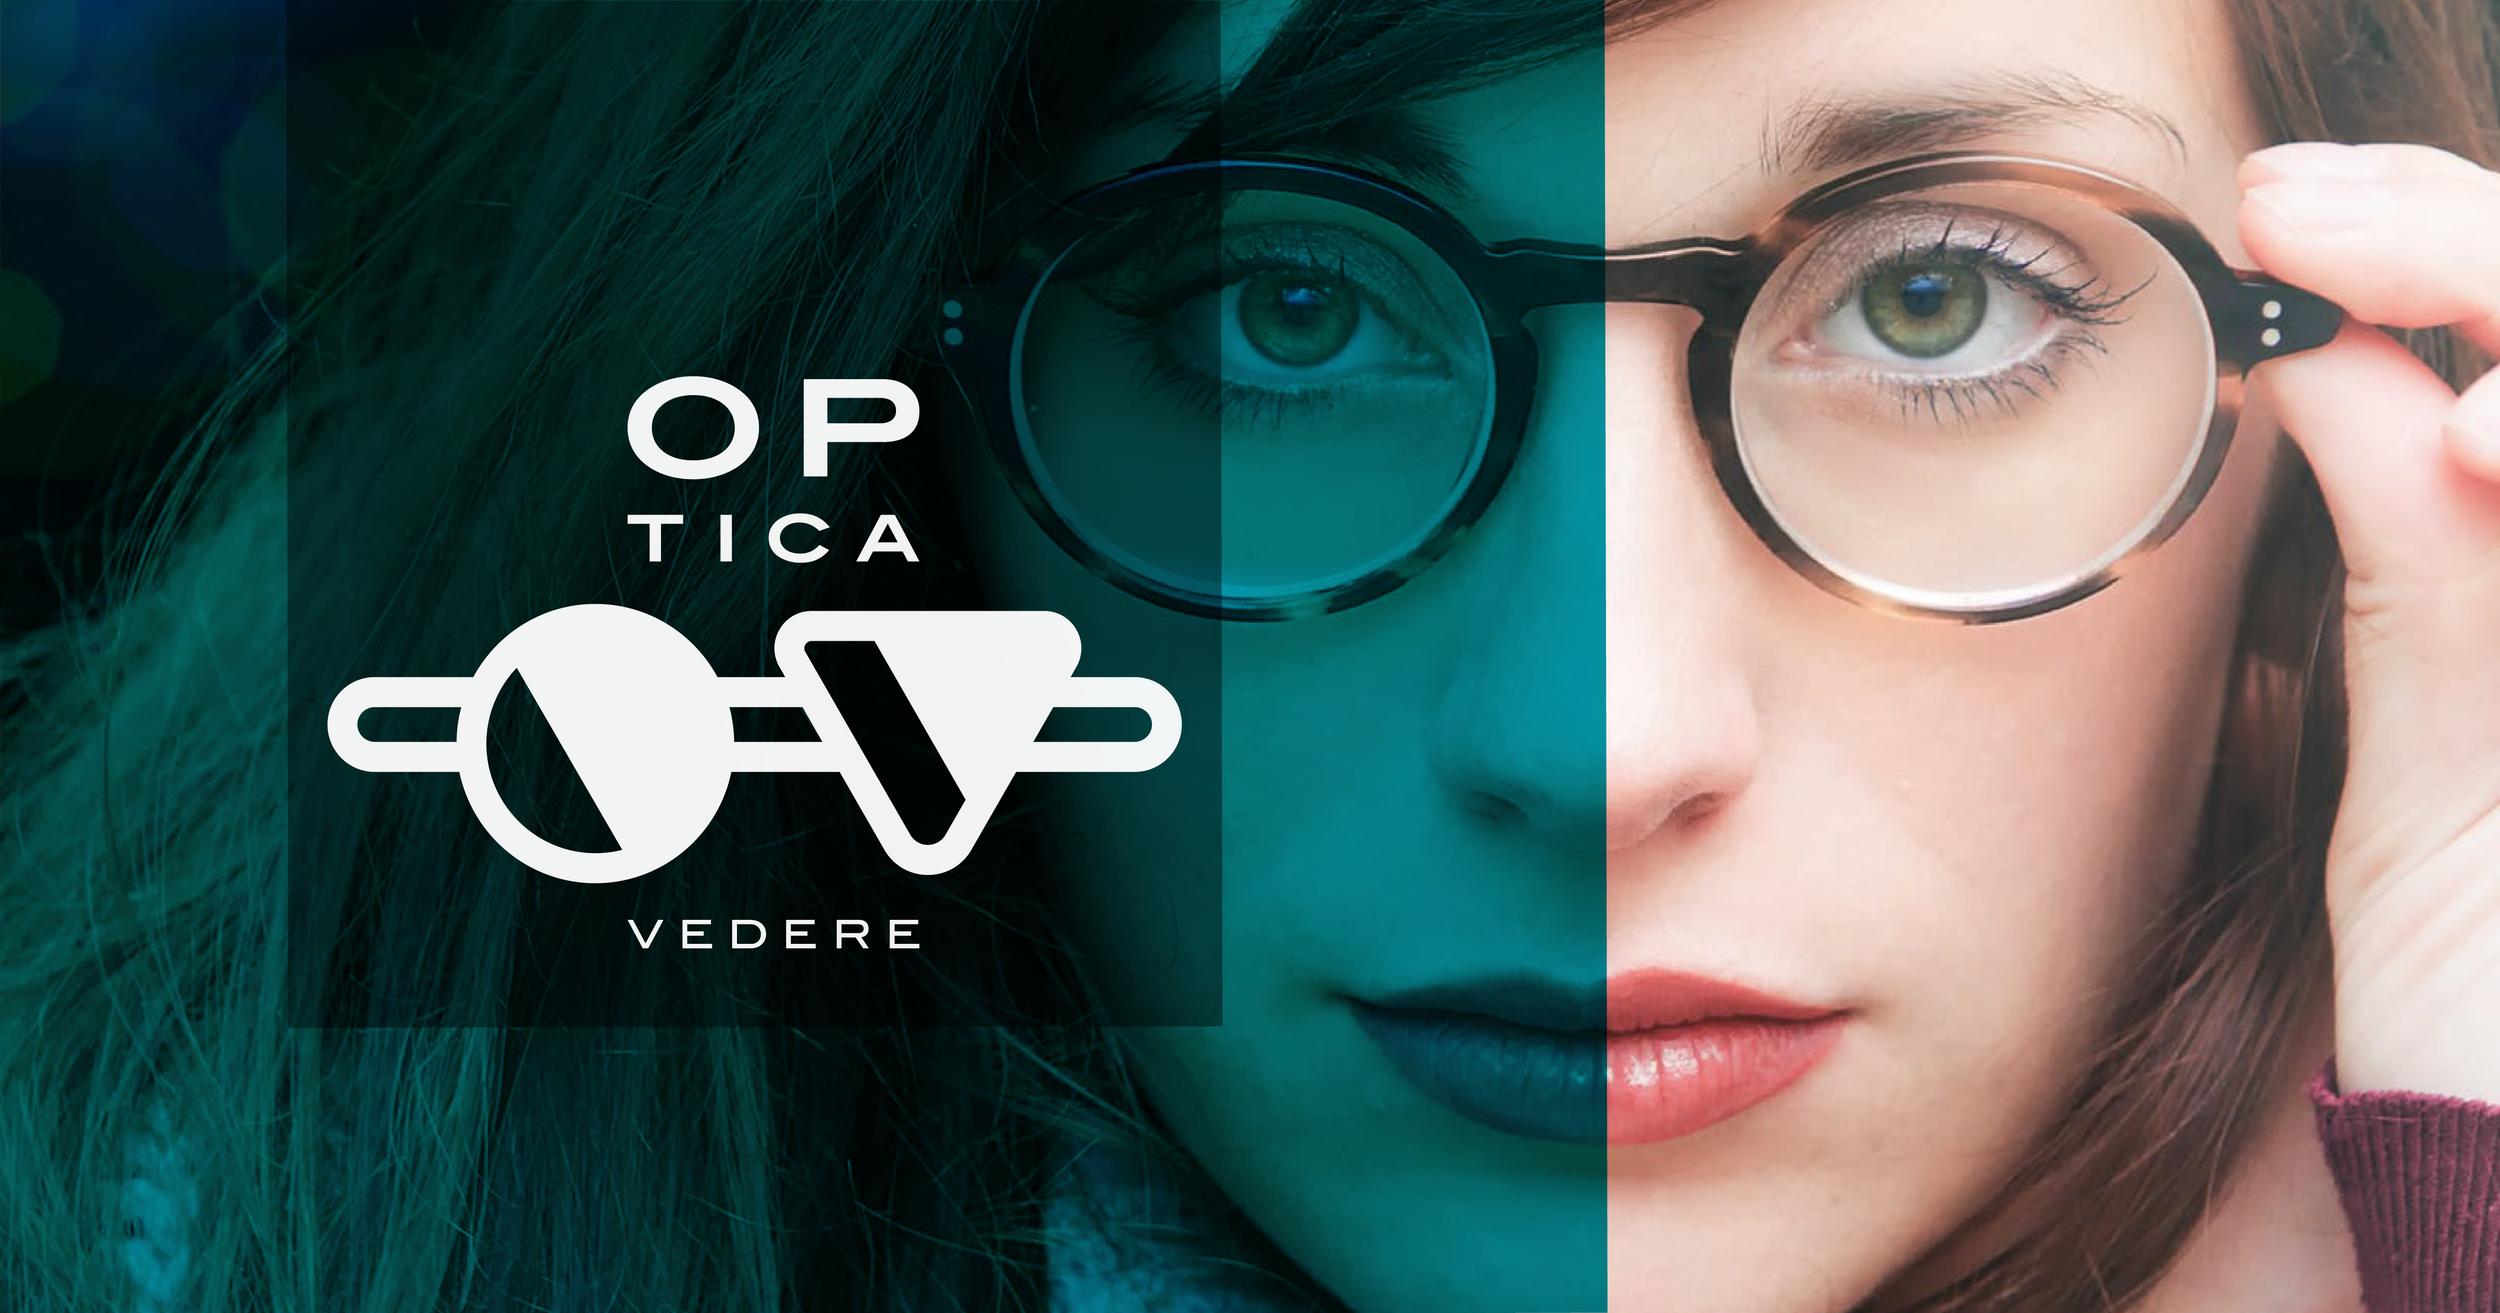 optica_vedere_design-01.png